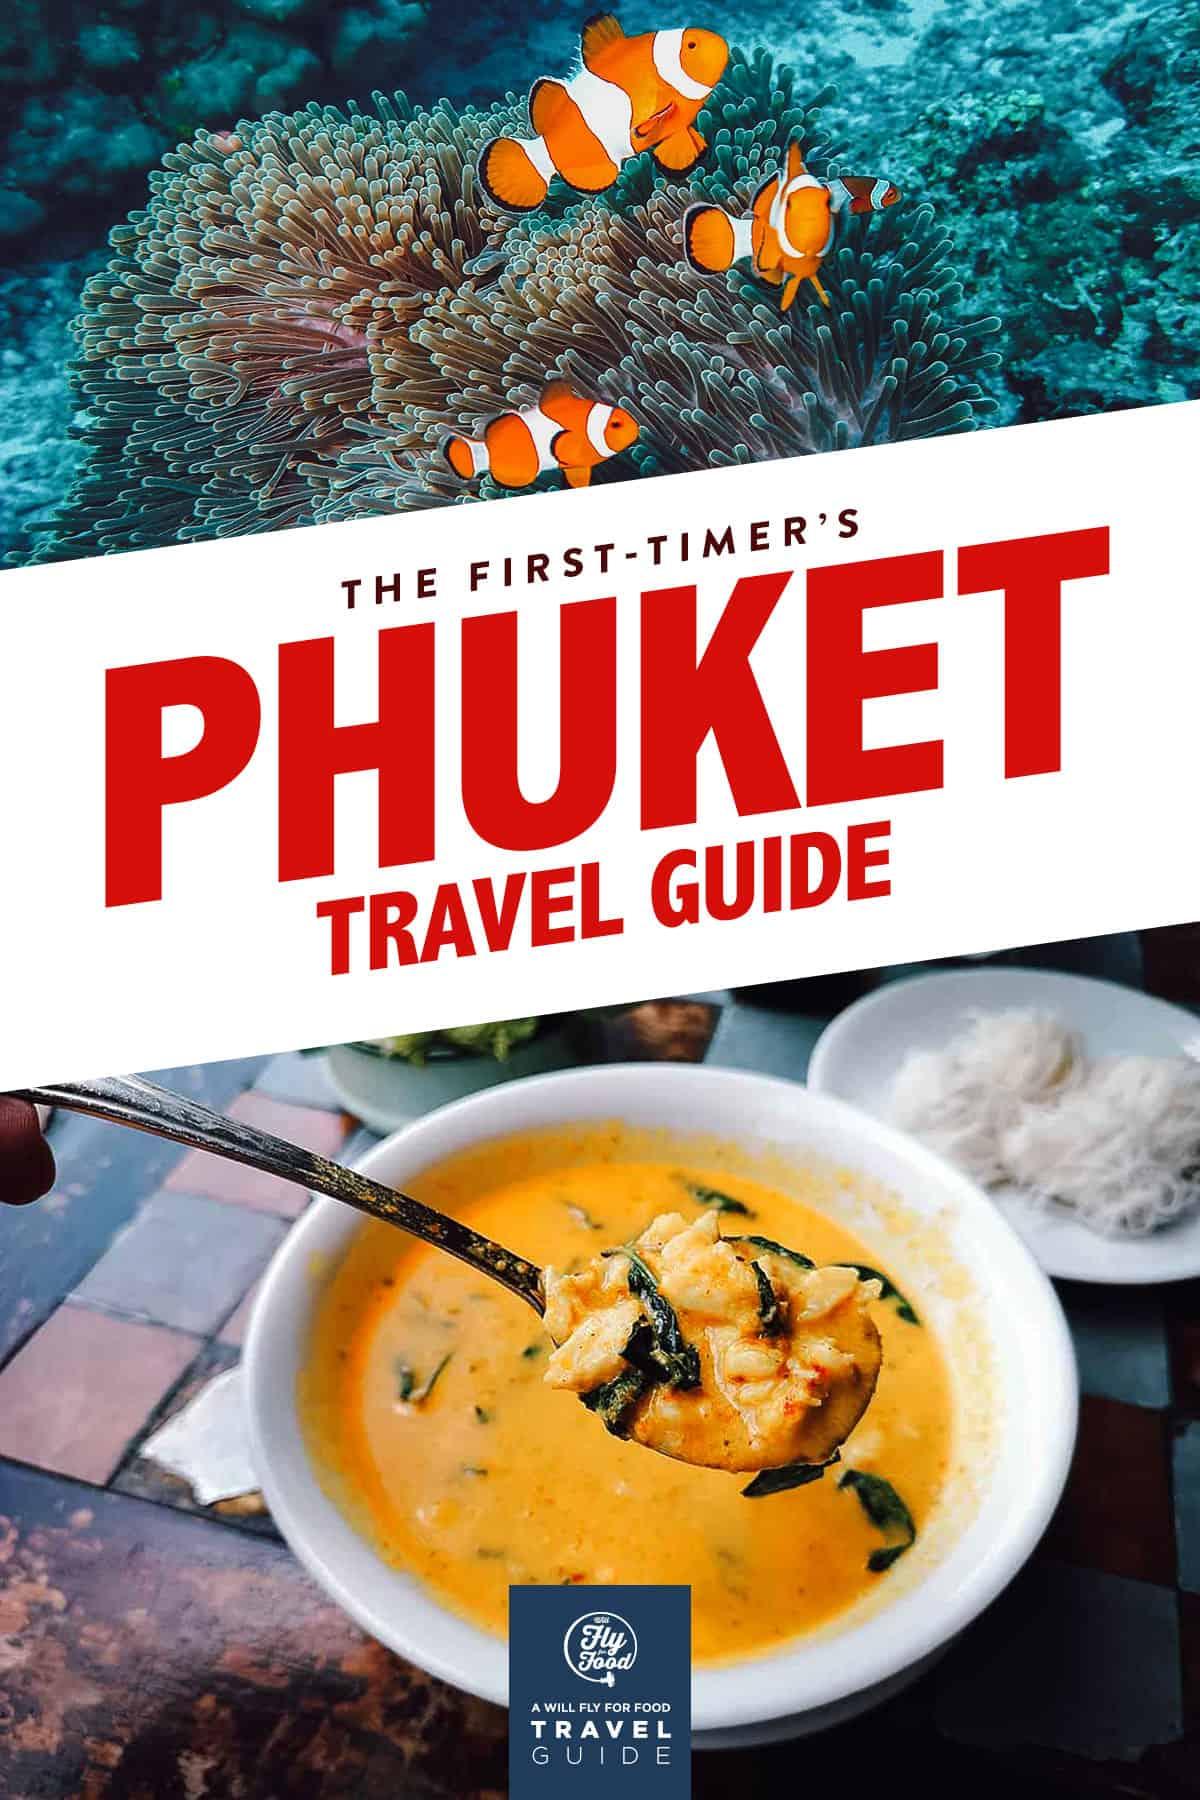 James Bond Island in Phuket, Thailand